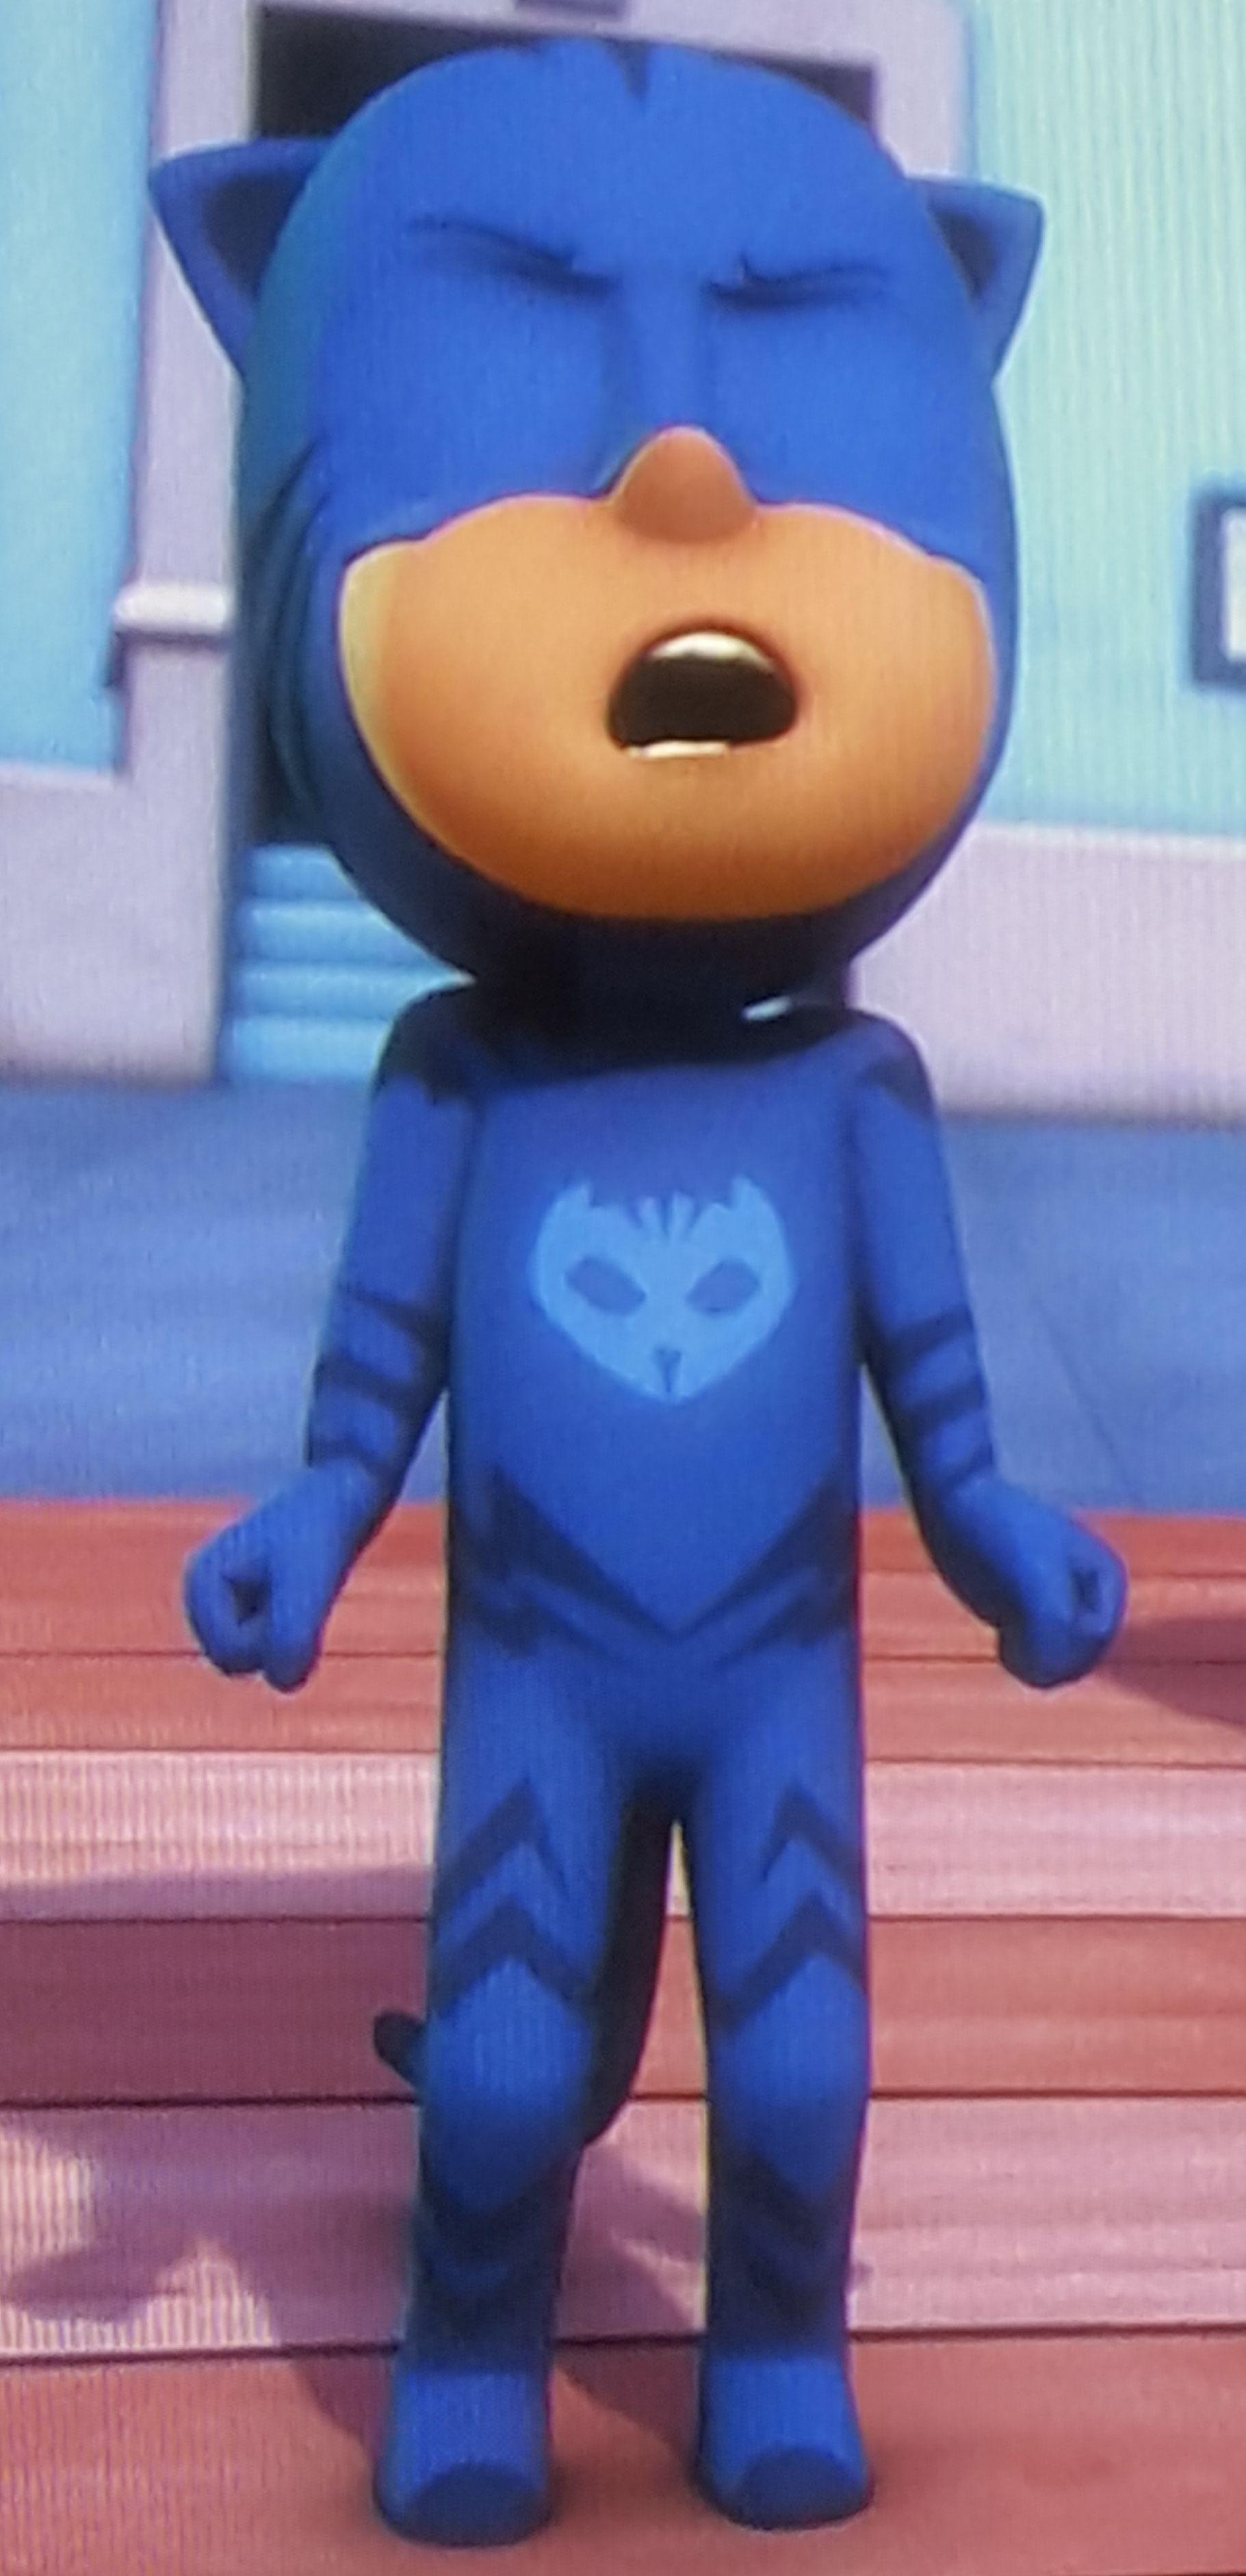 disney jr pj masks show catboy character - Disney Jr Halloween Costumes